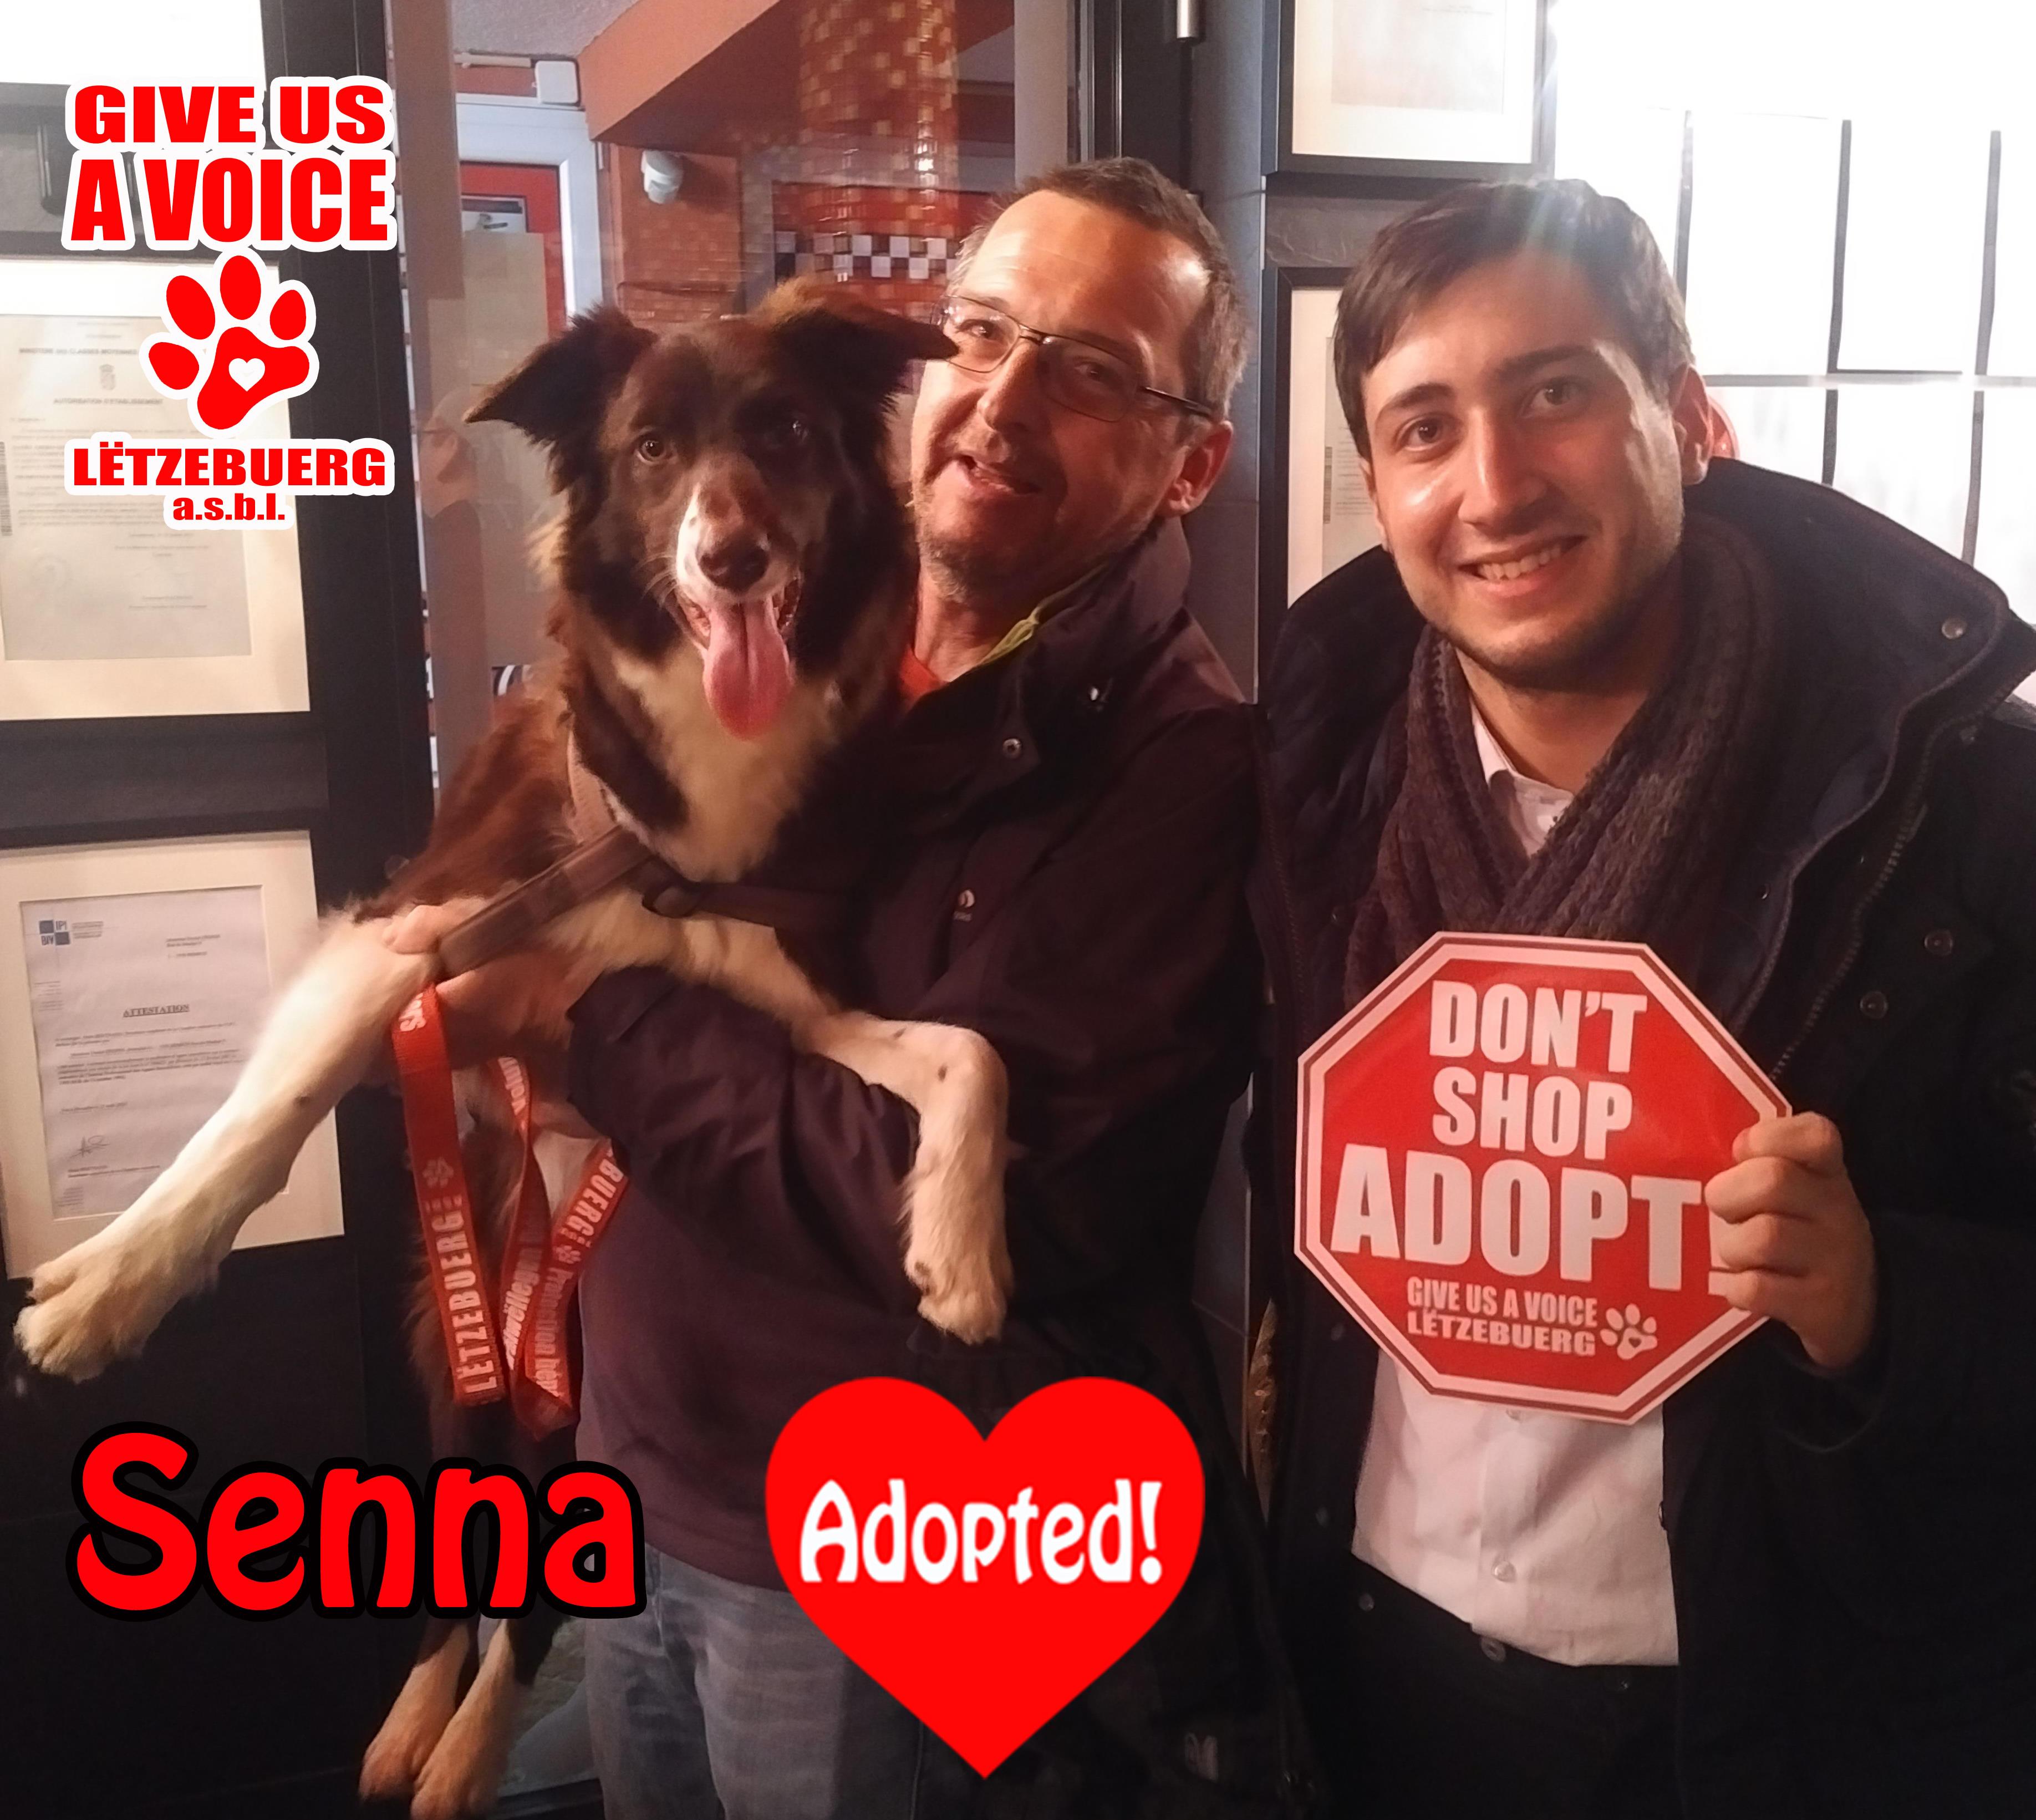 Senna Adopted! copy